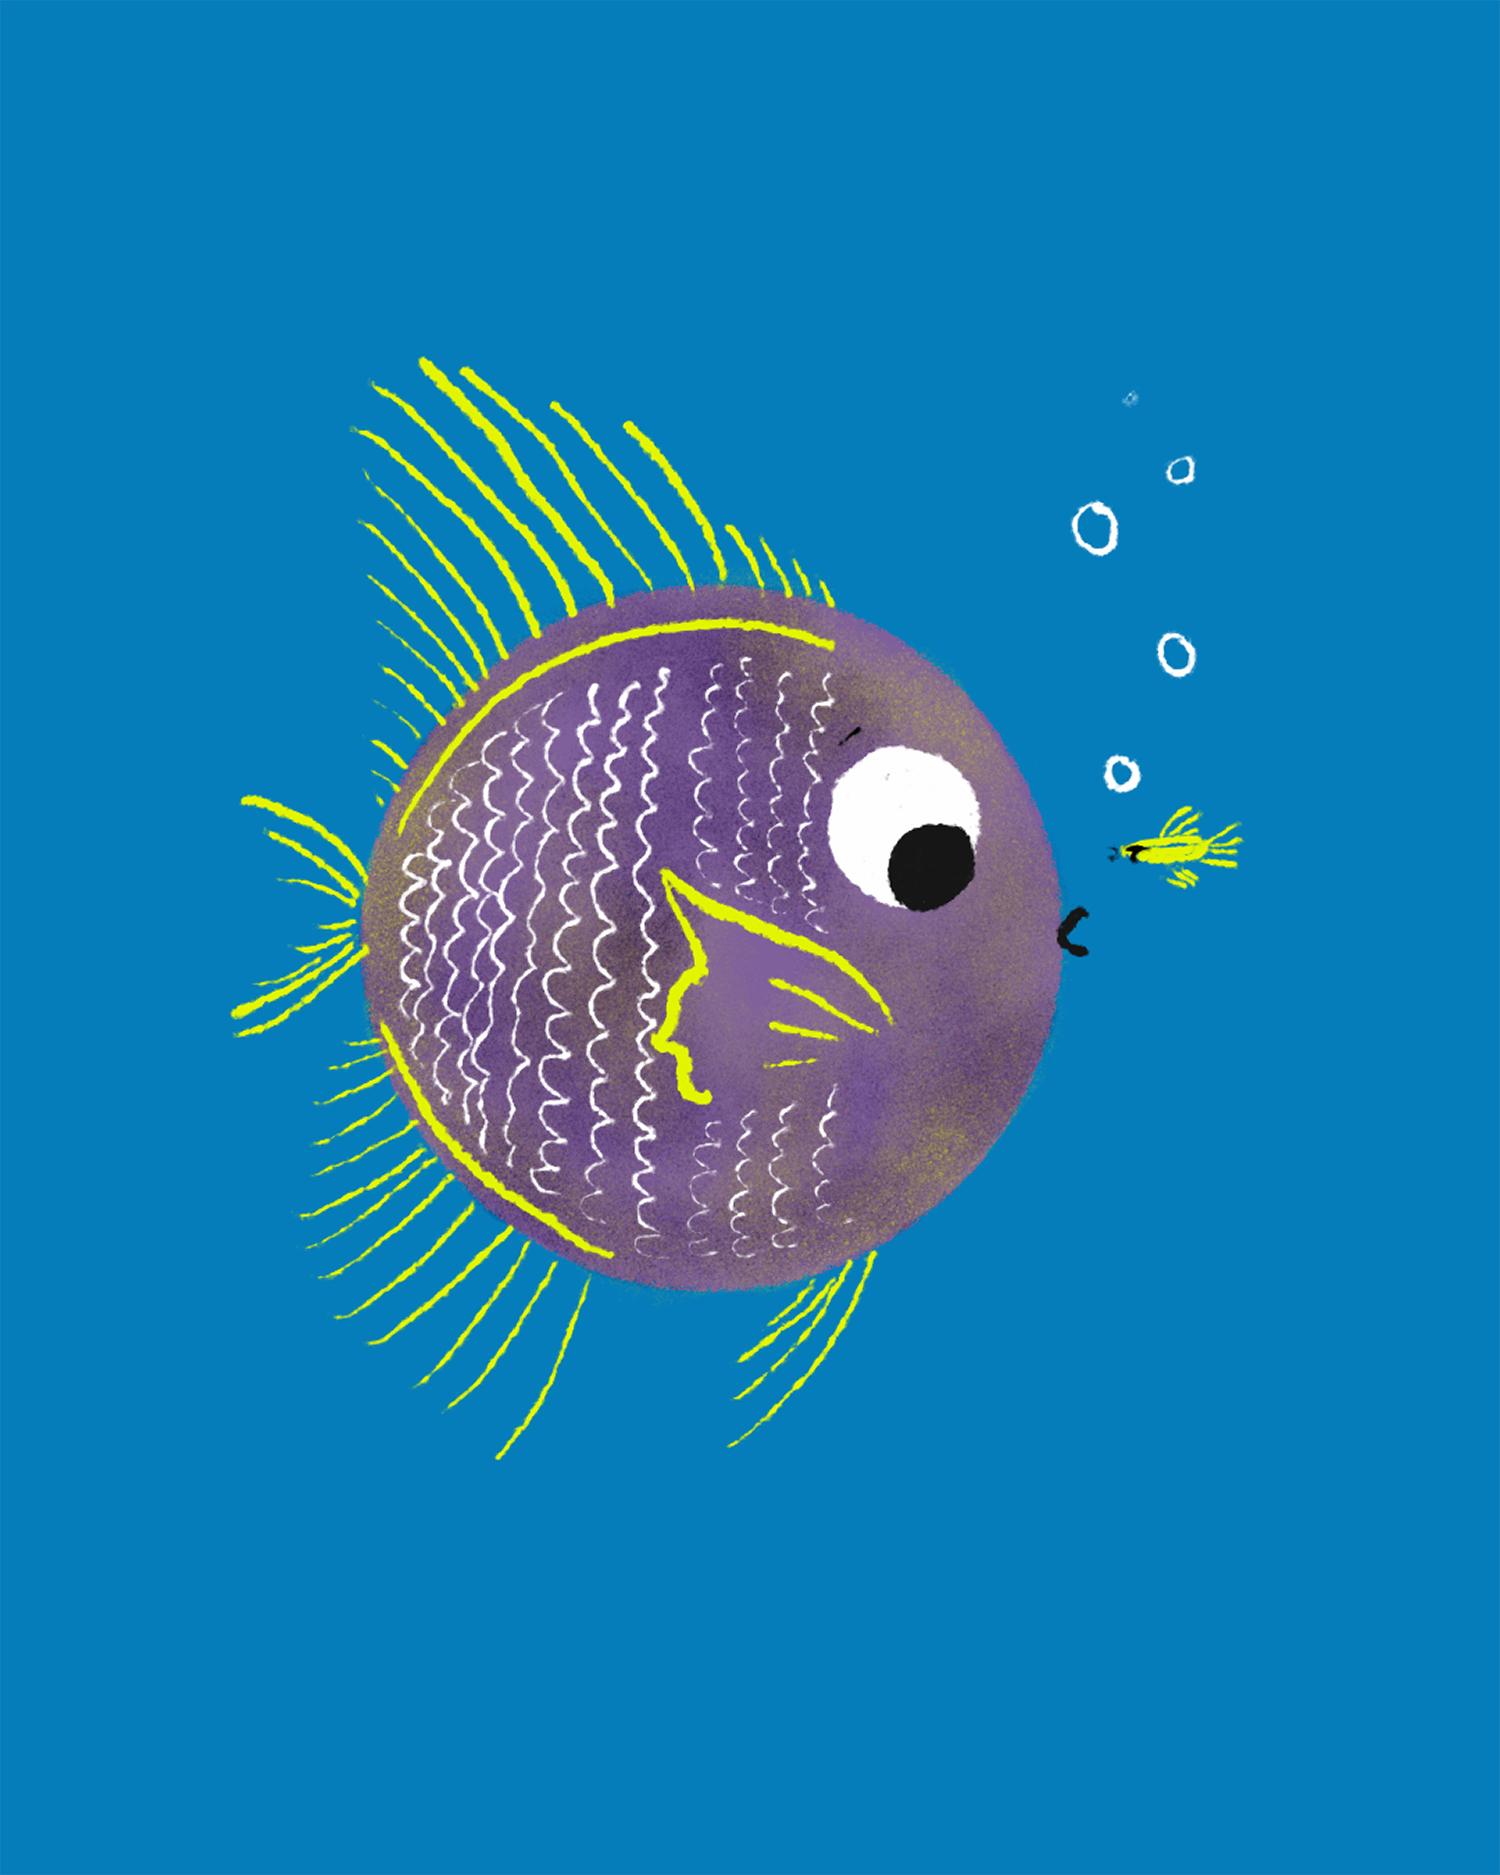 bonaddio_fishfriends_web_1500px_rgb.jpg